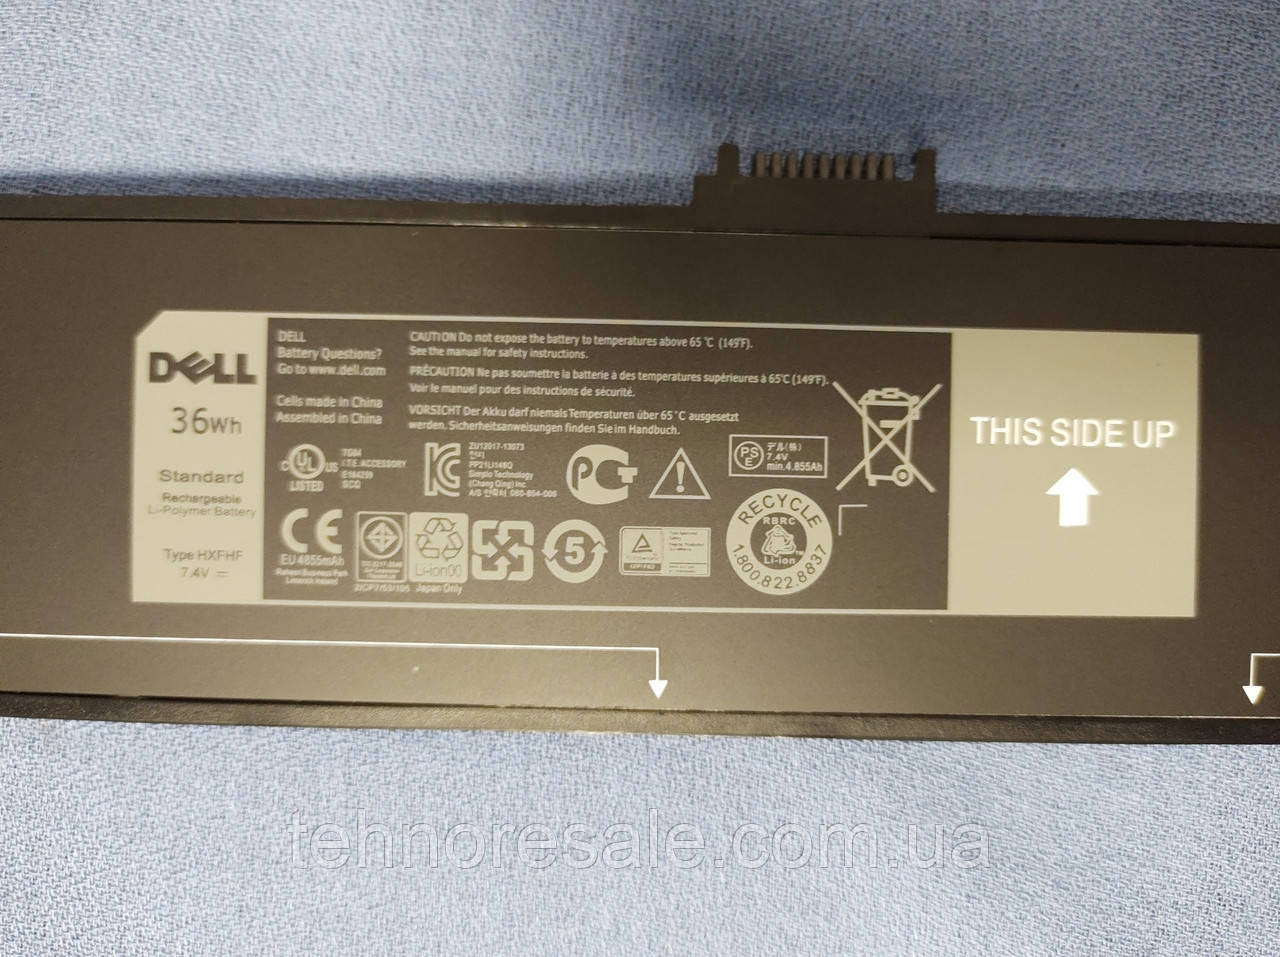 НОВА ОРИГІНАЛЬНА батарея для планшета Dell venue 11 pro 7130 7139 HXFHF